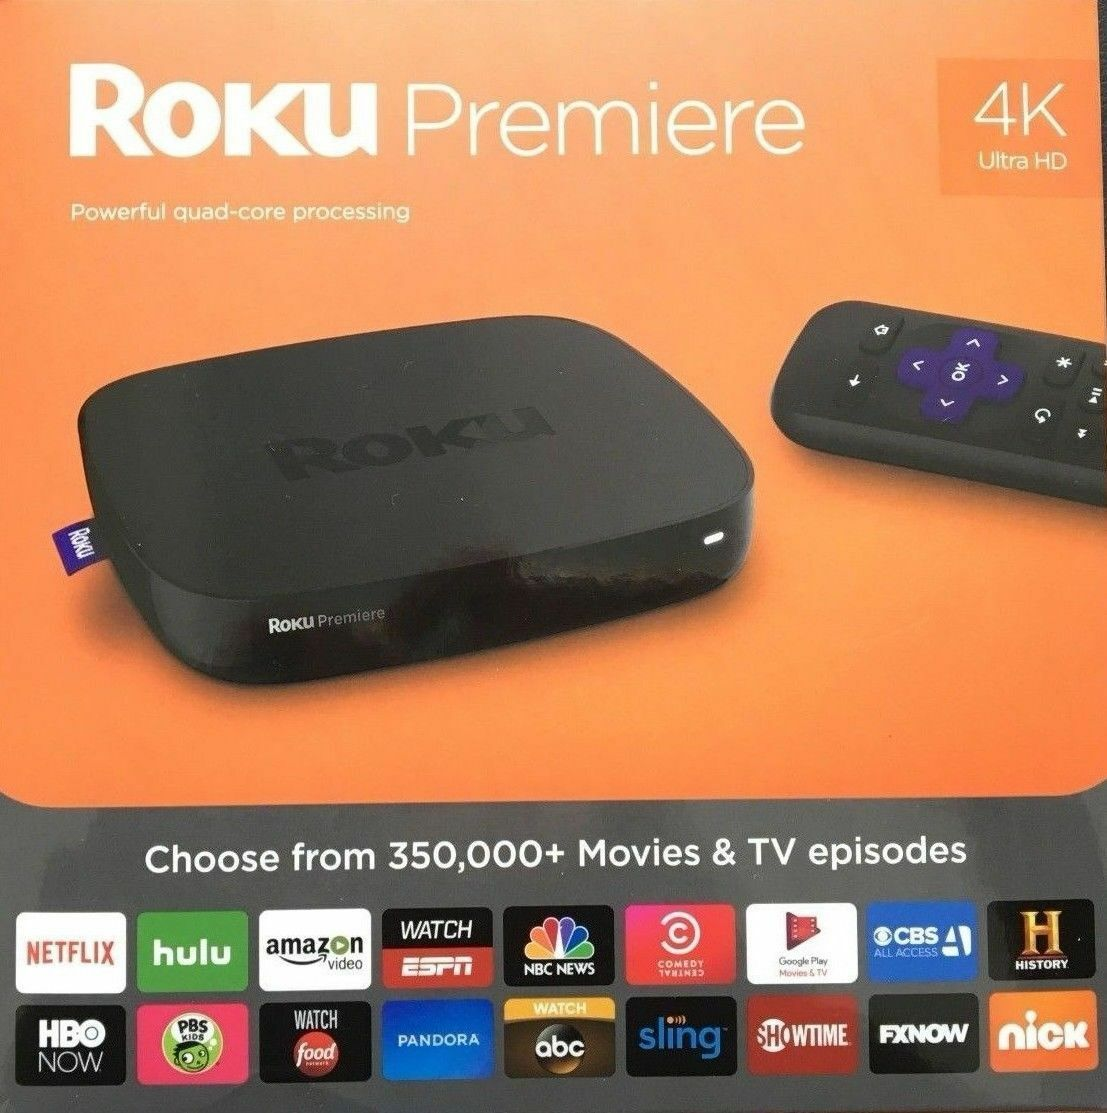 s-l1600 NEW! Roku Premiere 4K Ultra HD Streaming Media Player  (2016 Model)